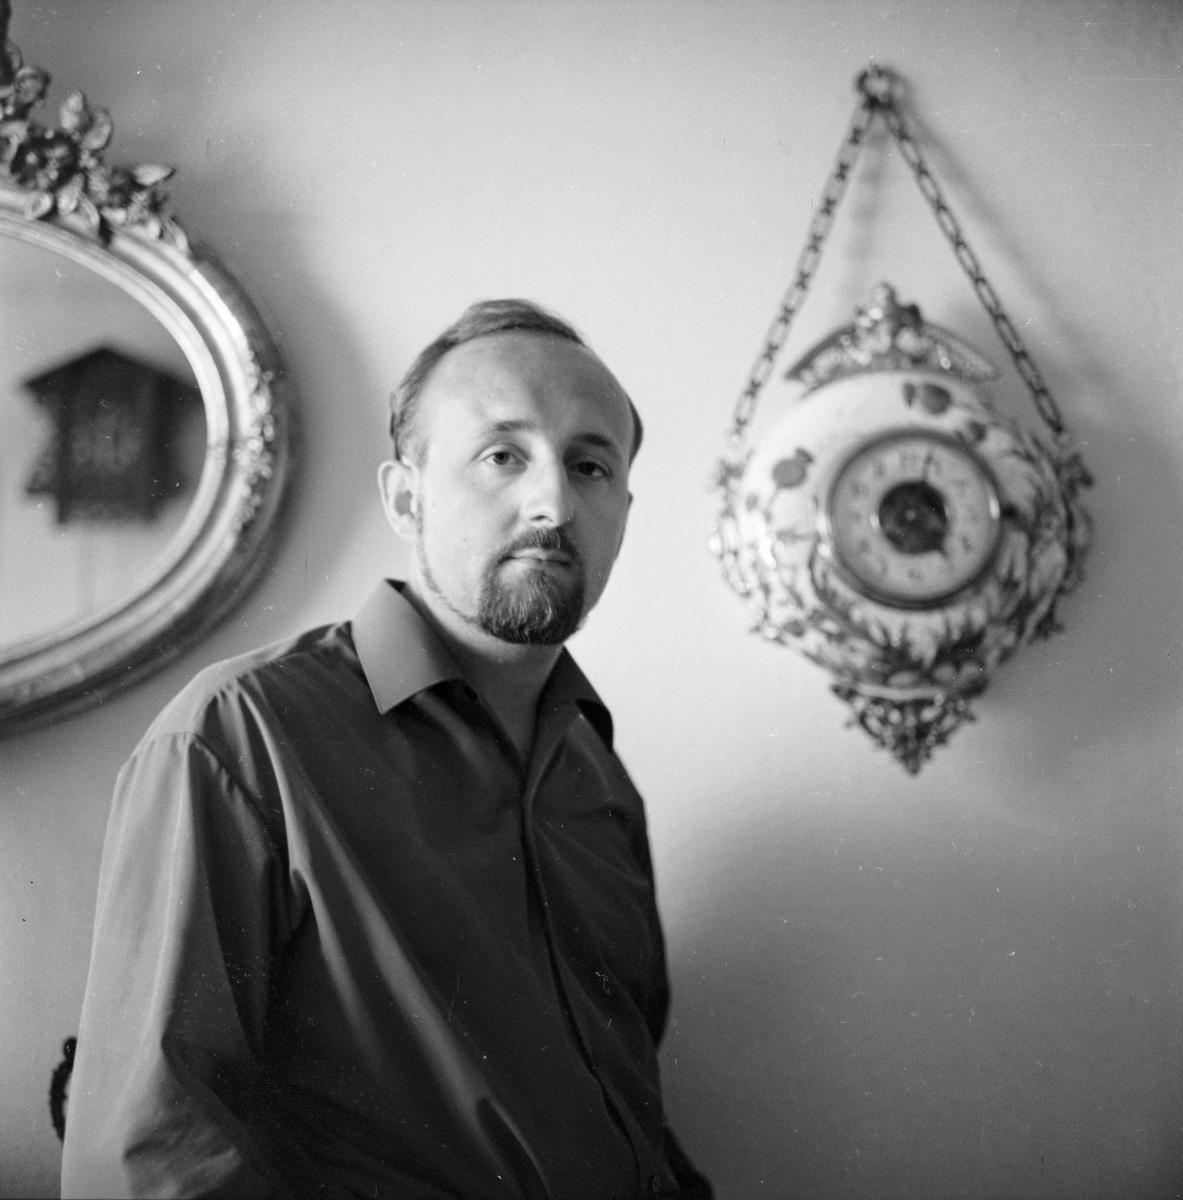 1183x1200 > Krzysztof Penderecki Wallpapers